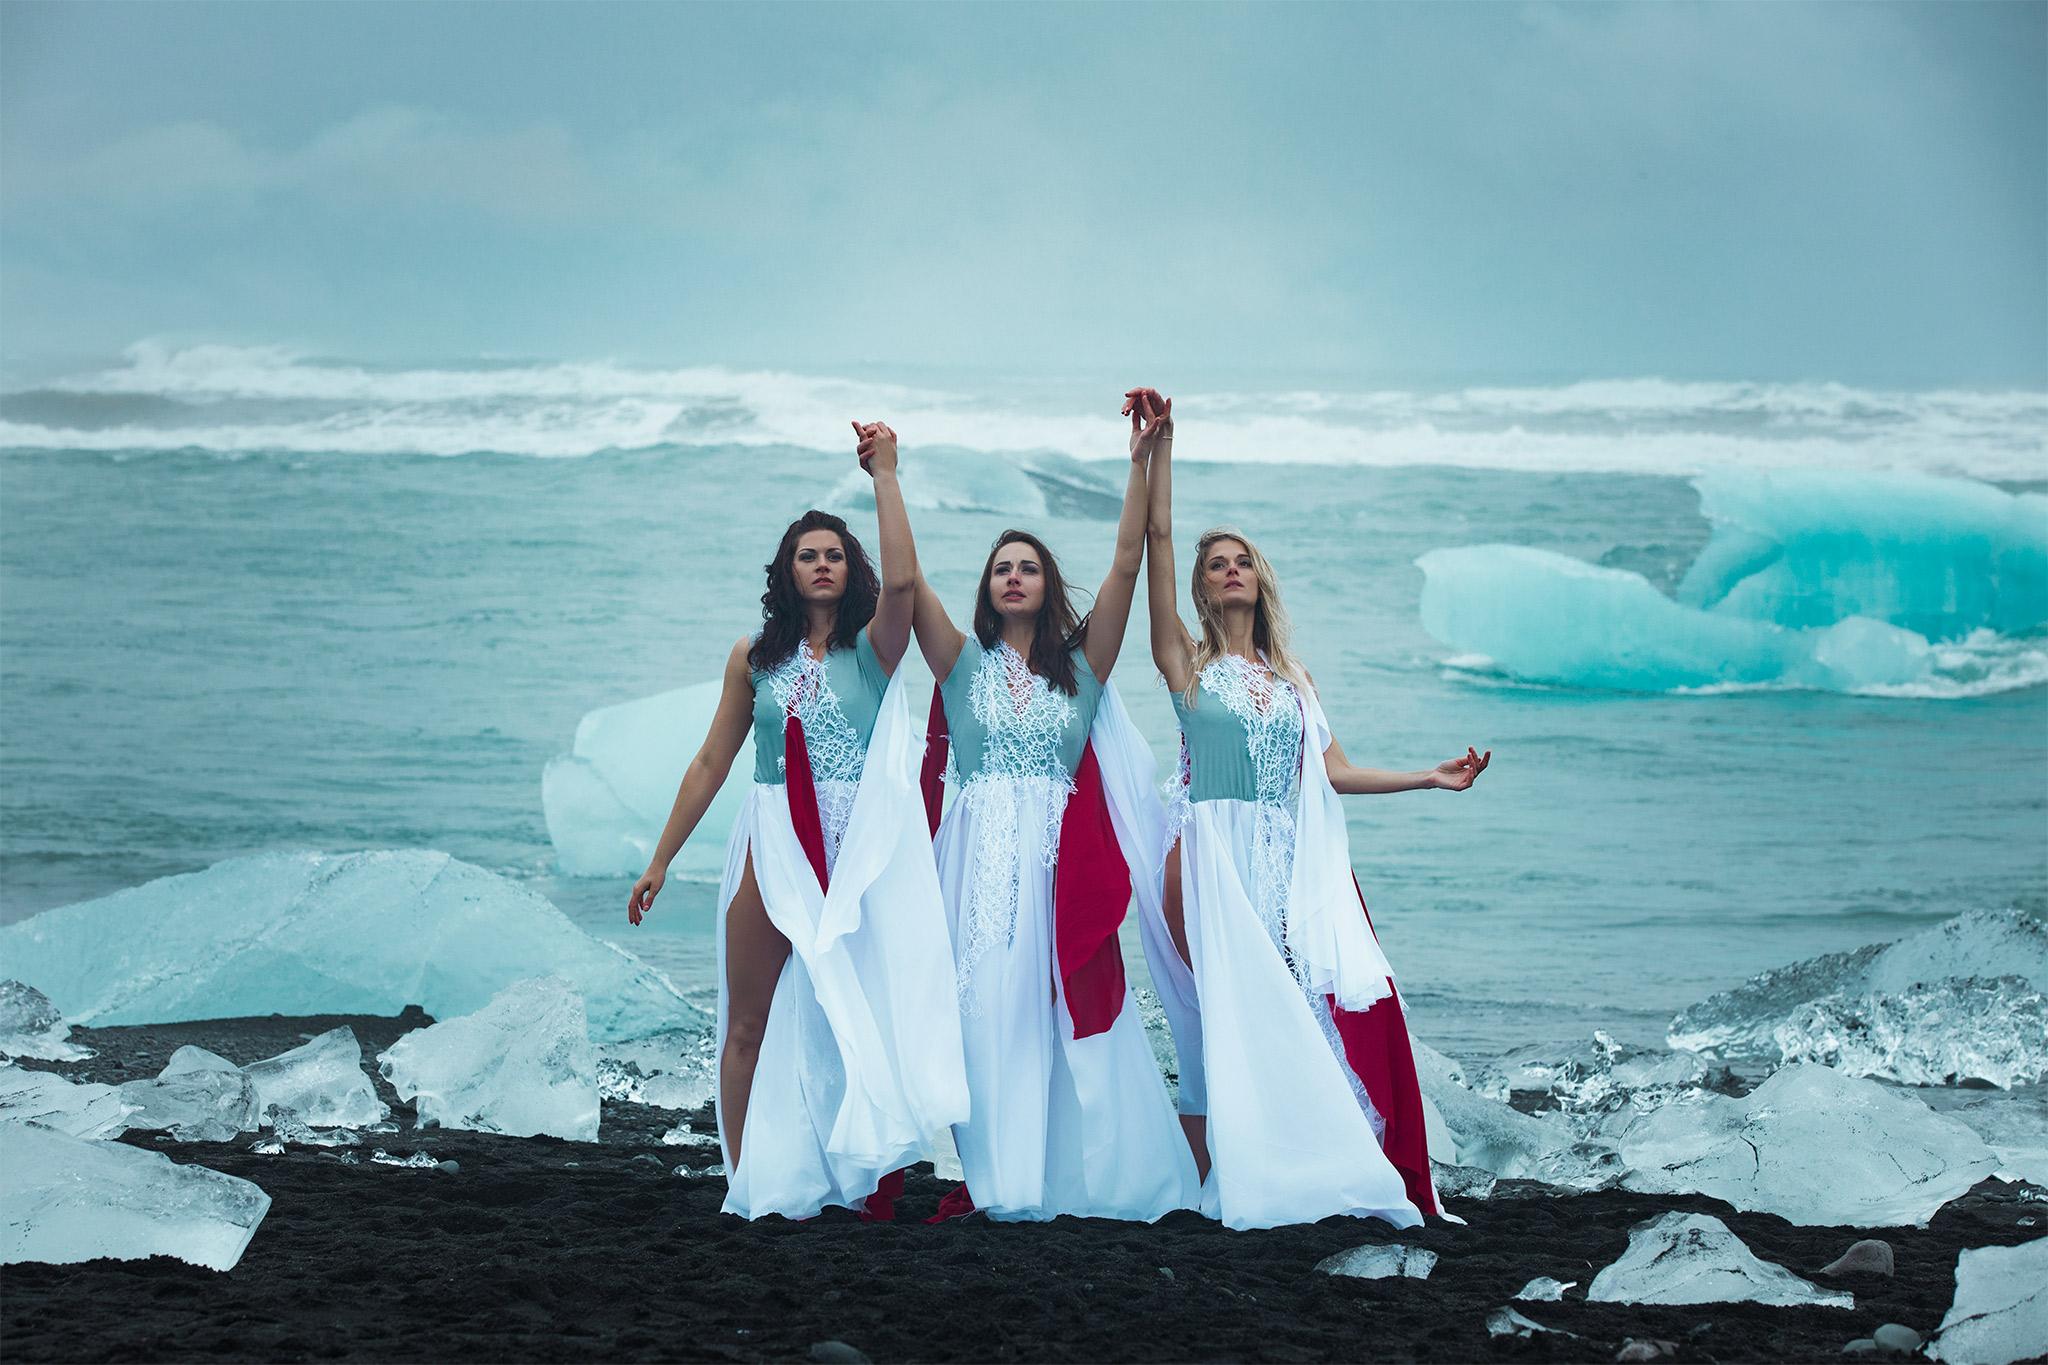 Grace-Almera-Iceland-Free-Spirit-Team-melting-glaciers.jpg